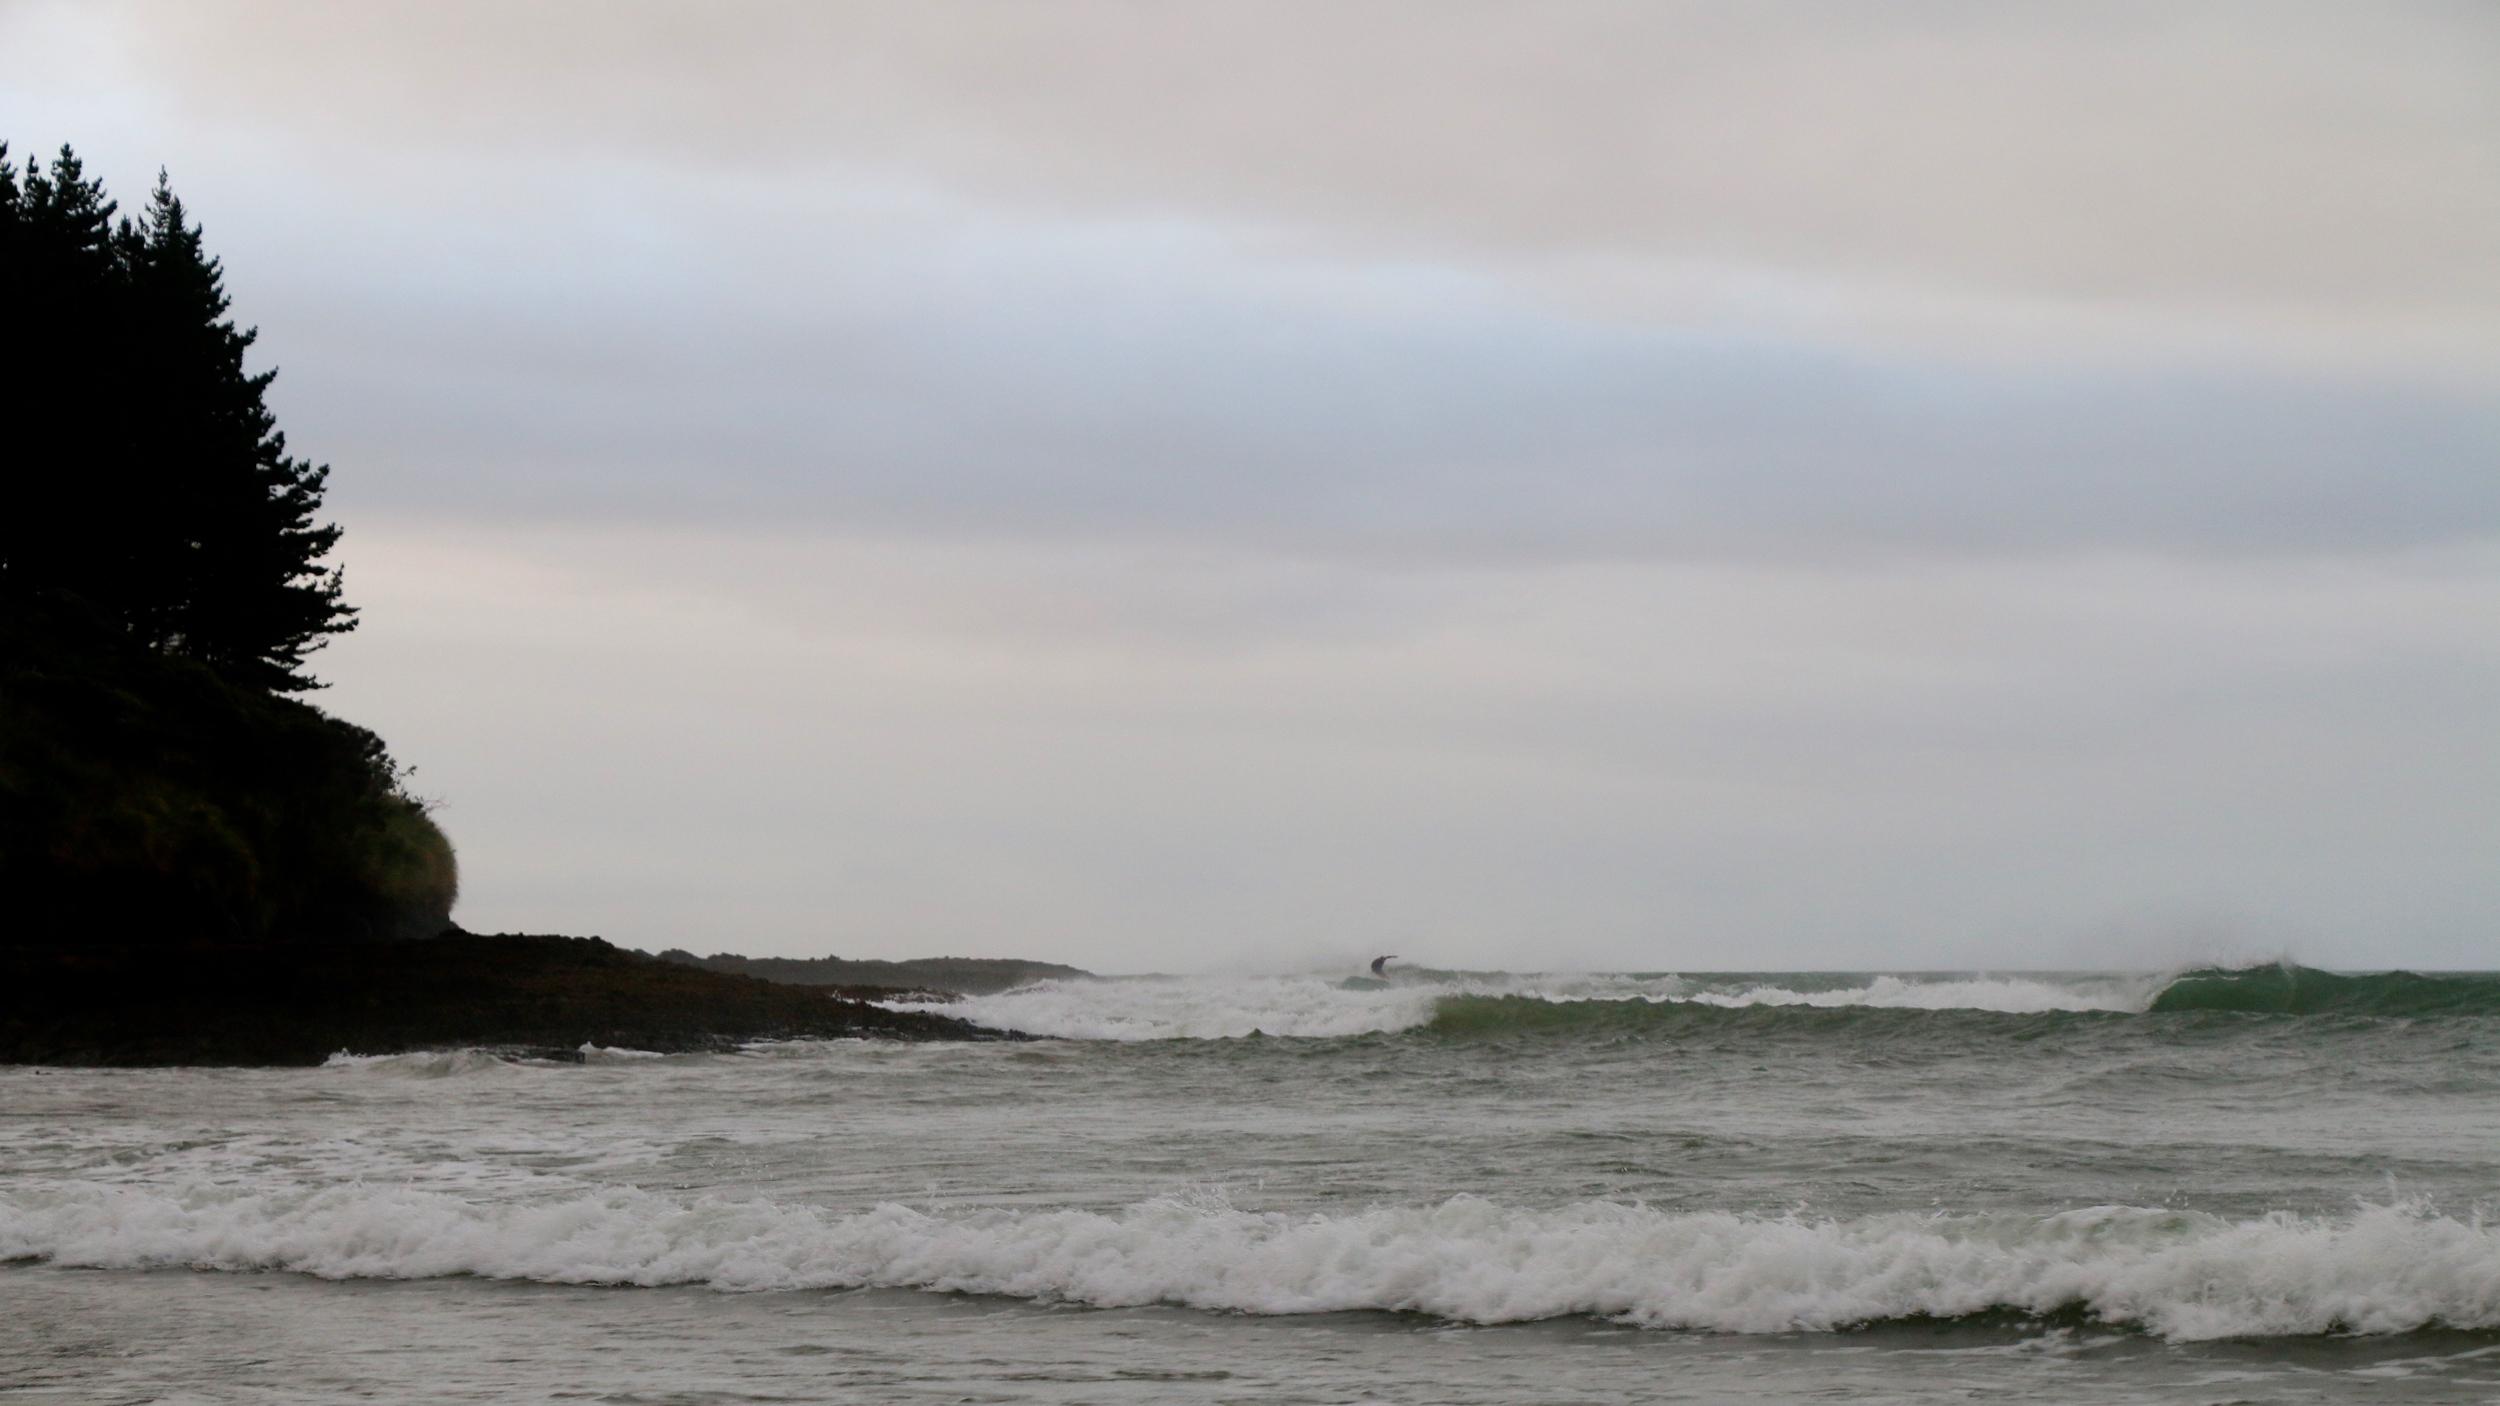 Pointbreak at Shipwreck Bay